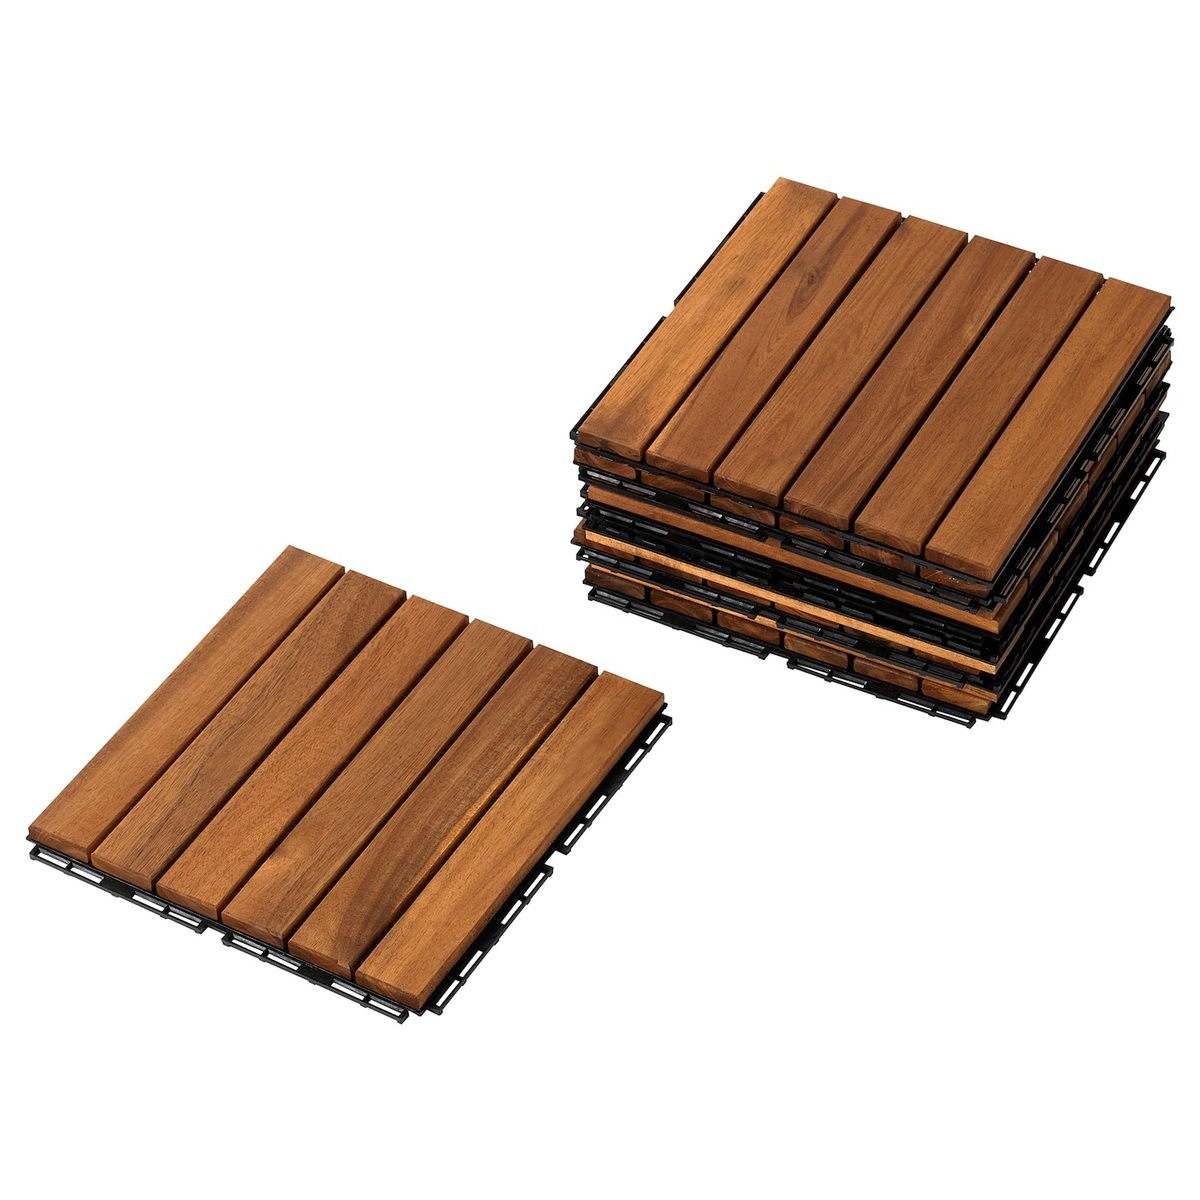 Catalogo parquet IKEA Enero 2021 FOTOS suelo madera runner